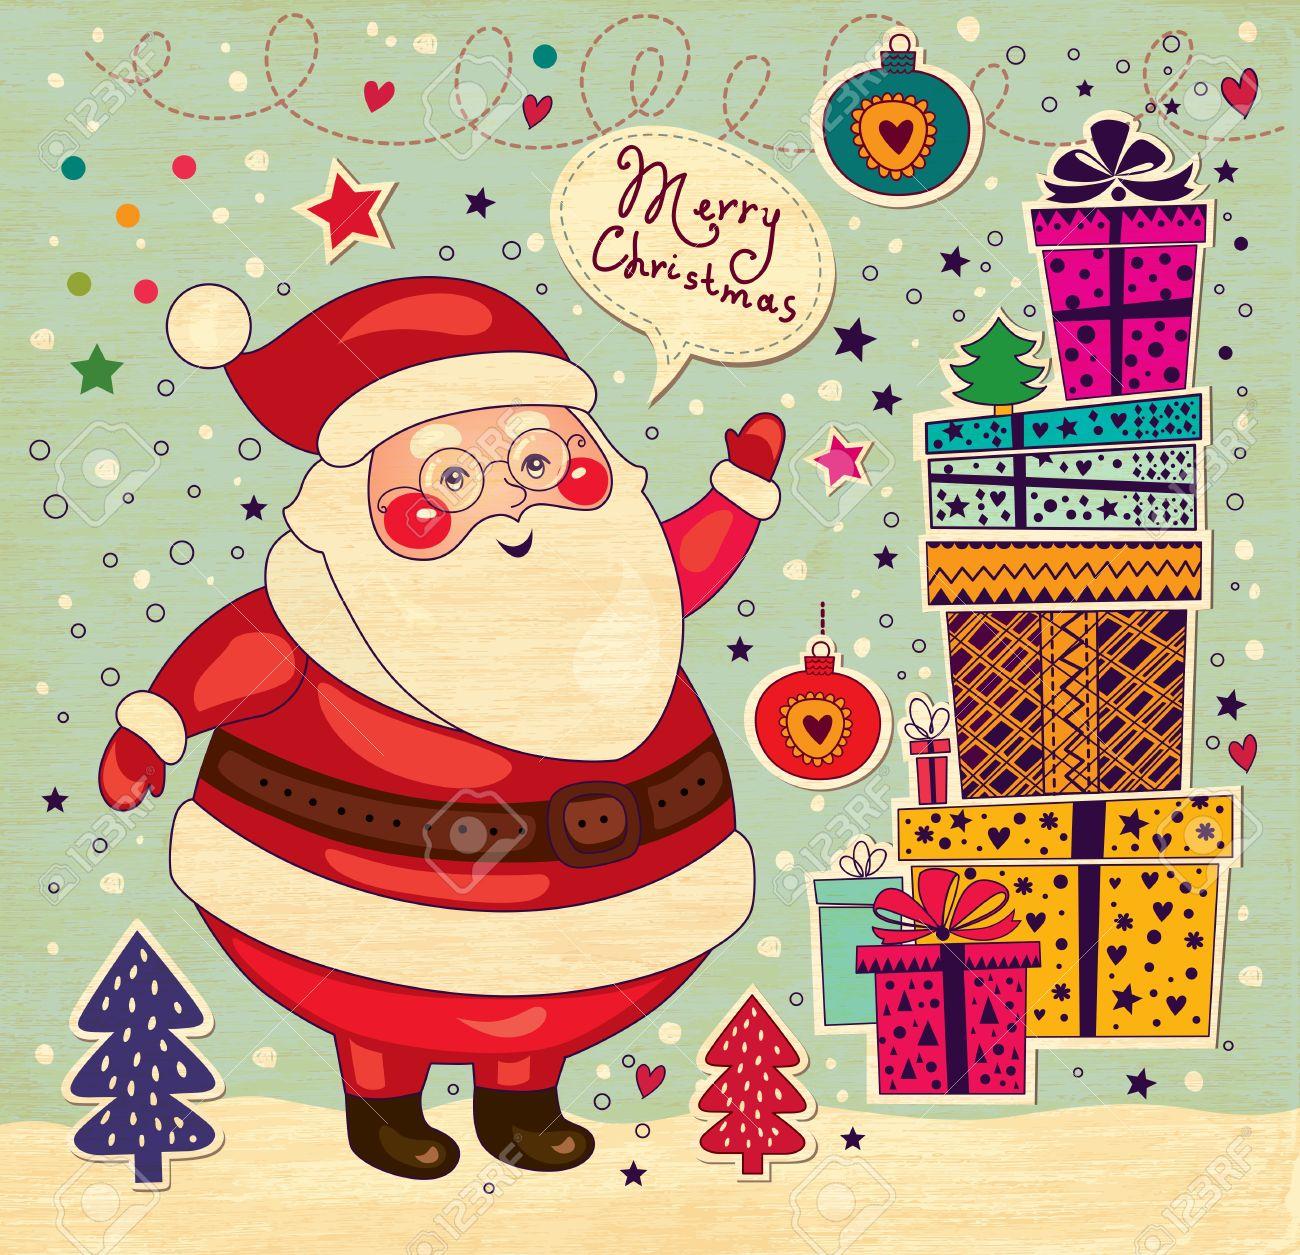 Christmas card with Santa Claus Stock Vector - 16439903